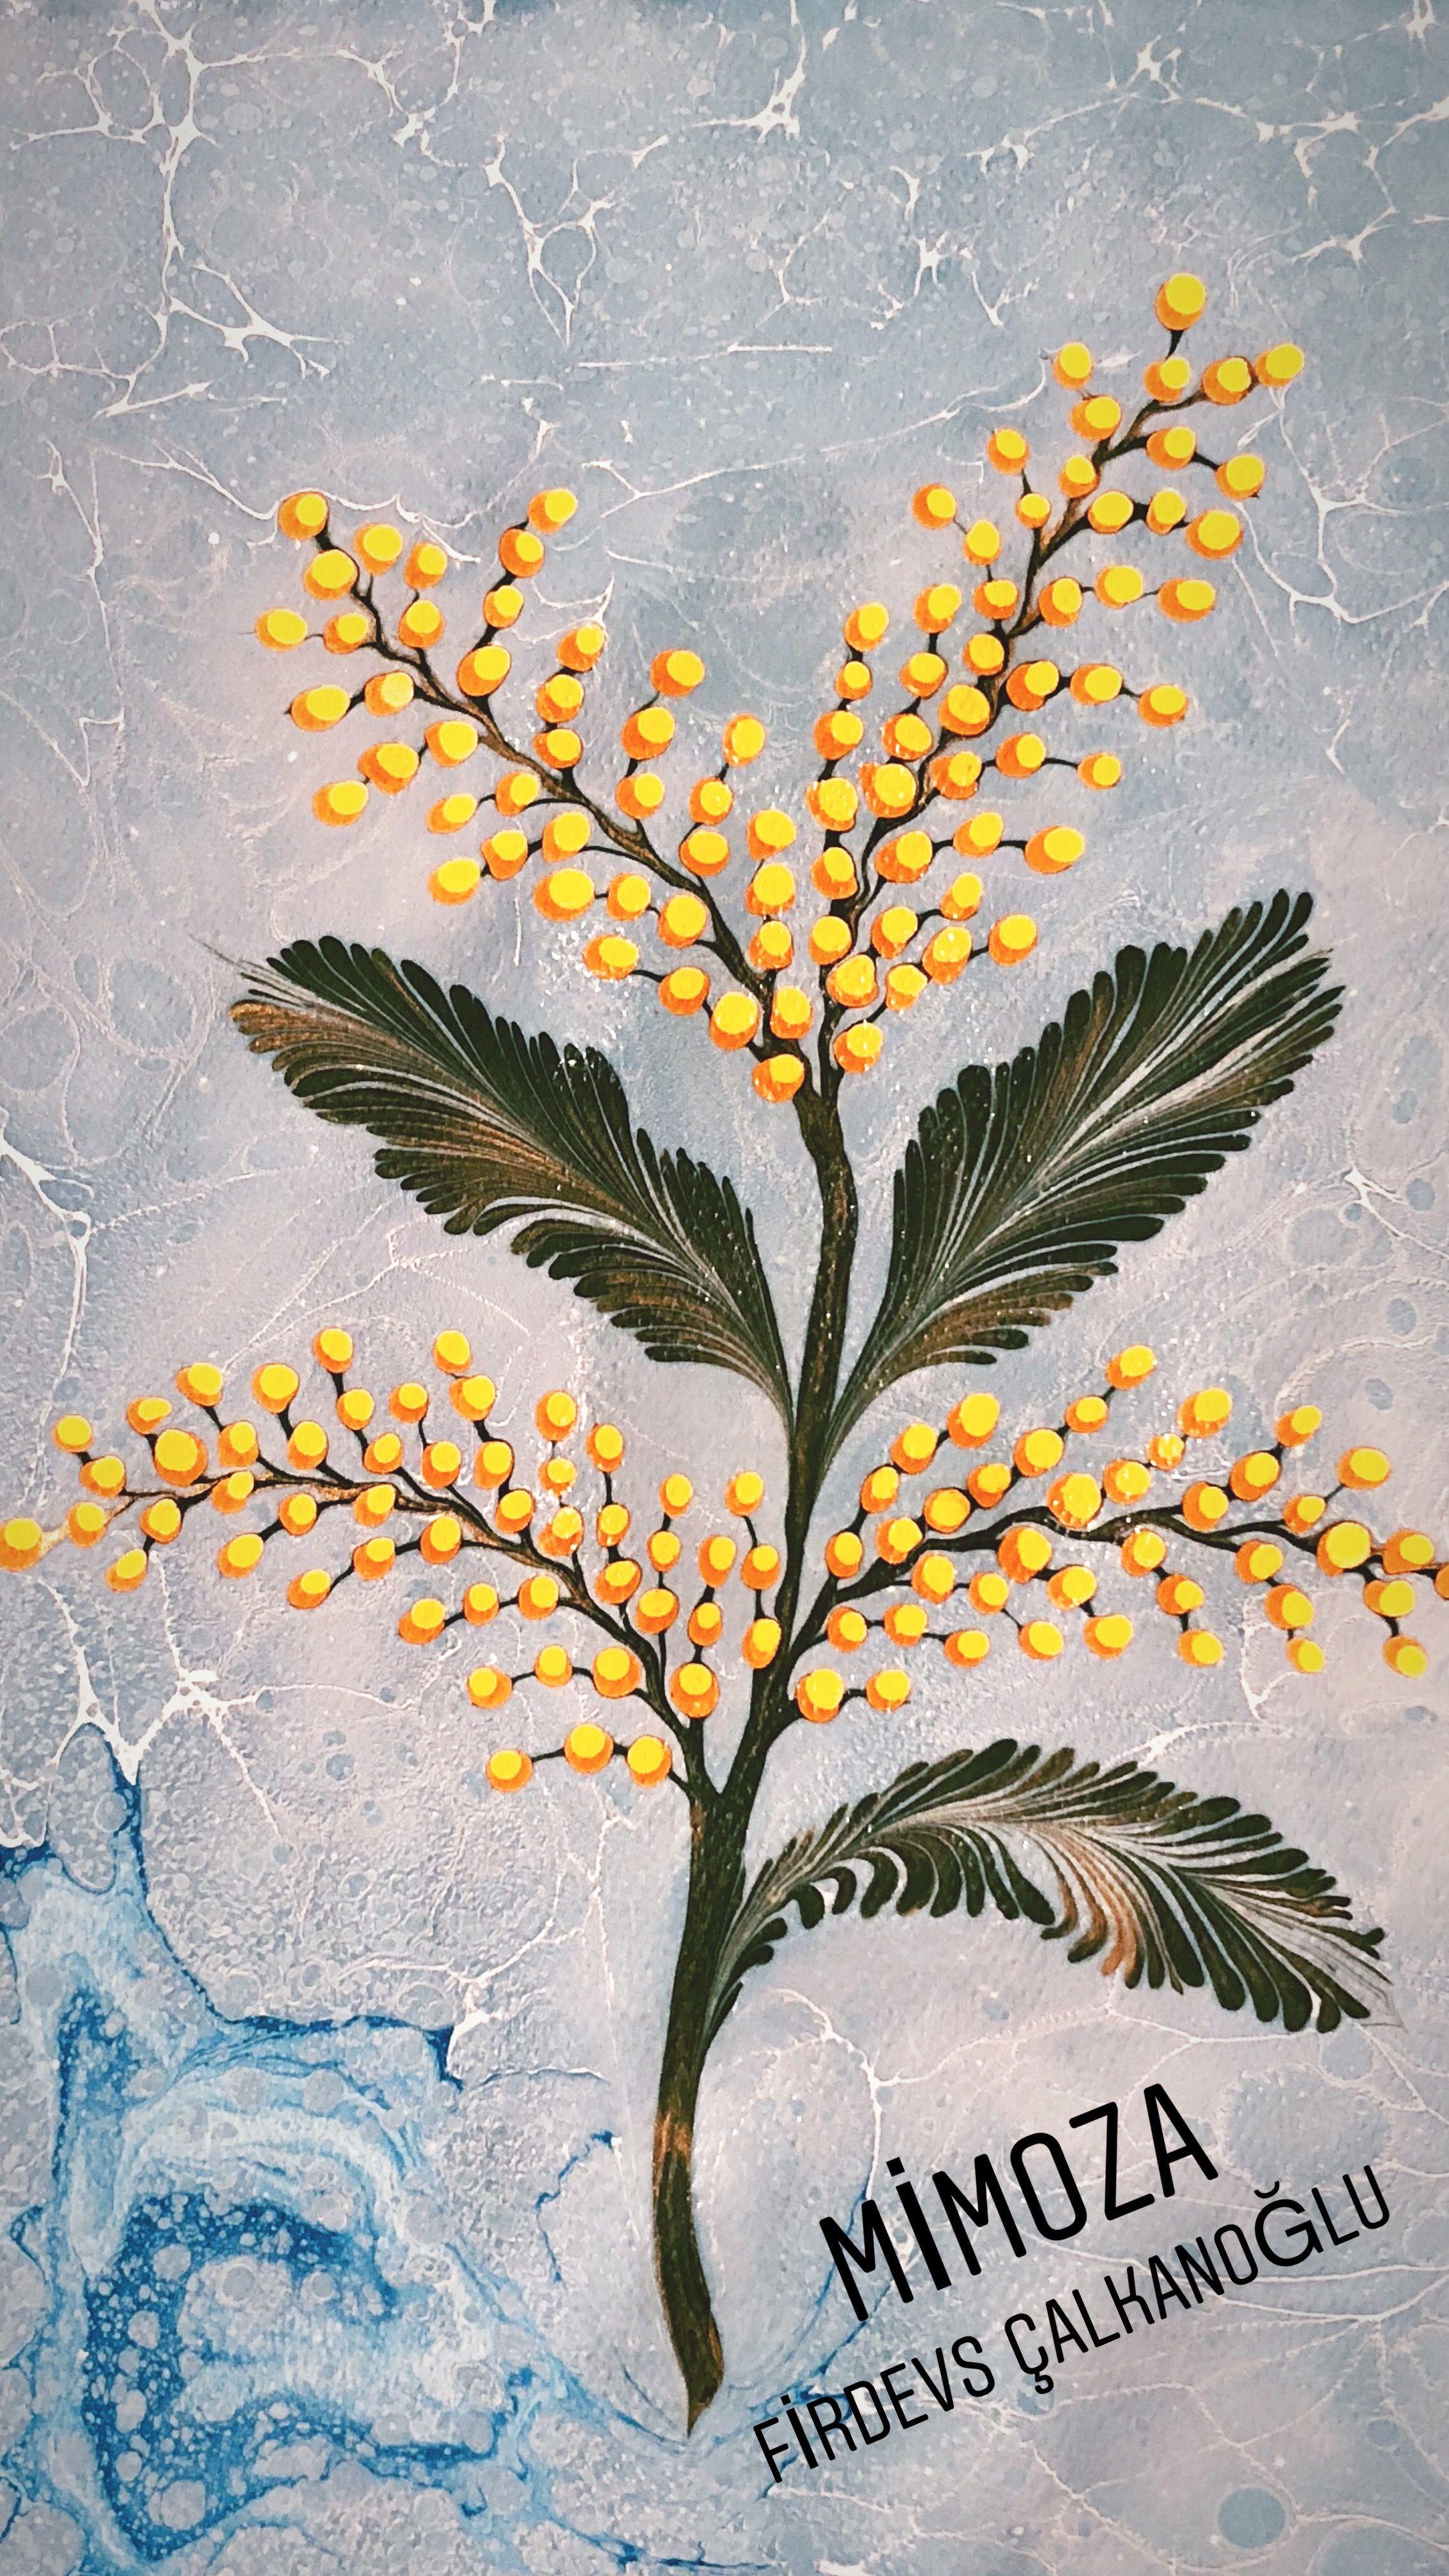 Mimosa Flower Marbling Artist Firdevs Calkanoglu Resim Sanati Cizimler Sanat